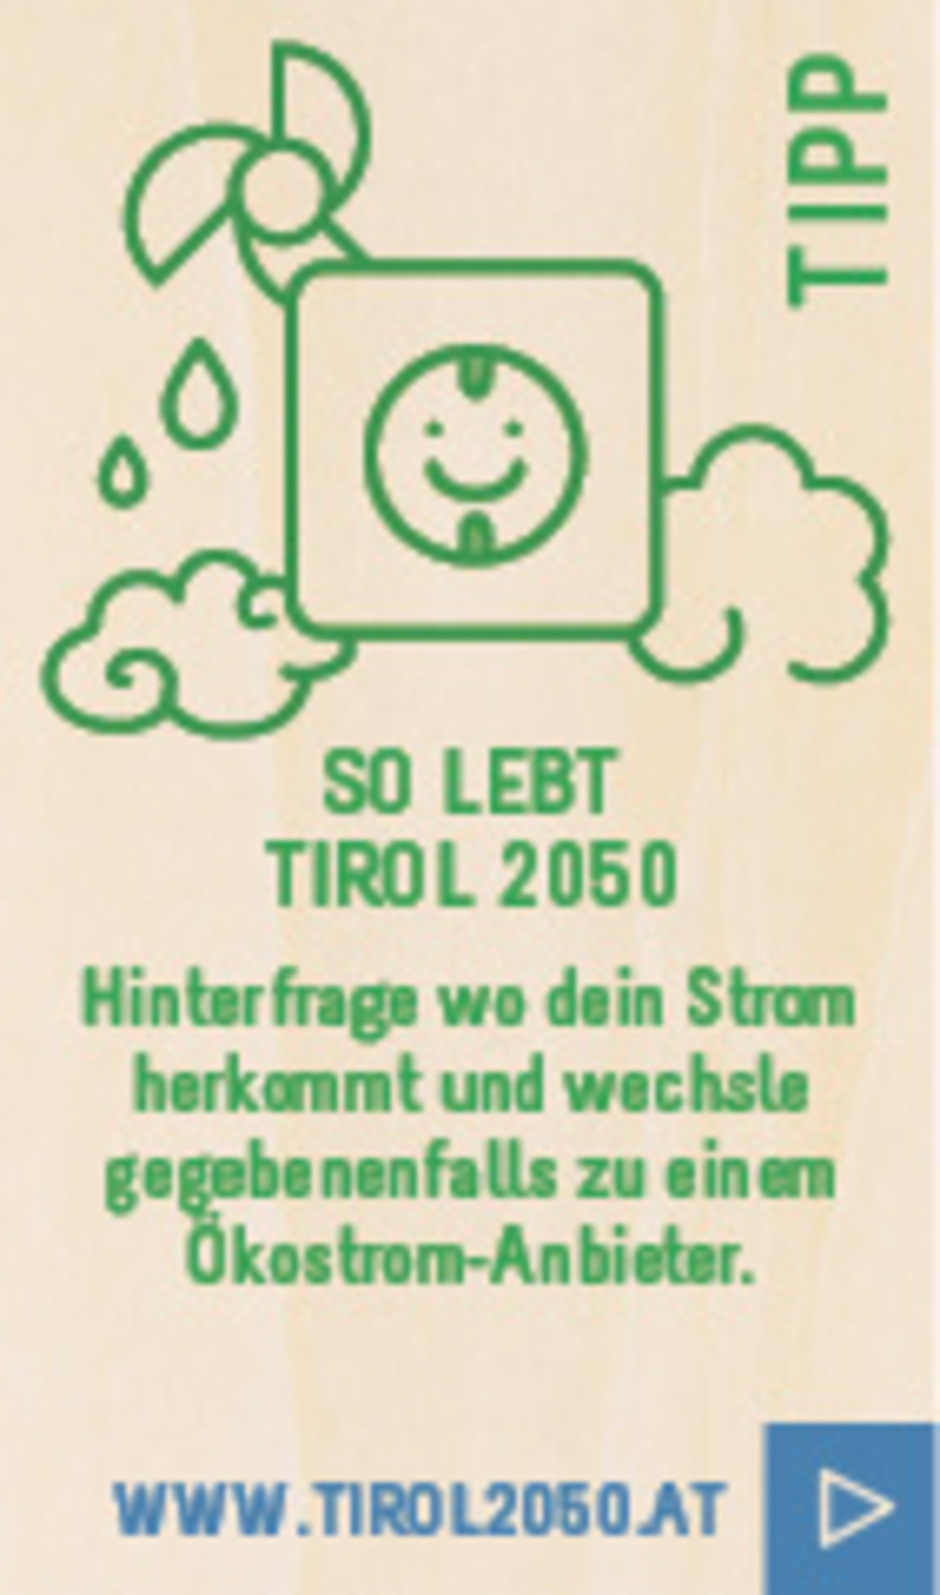 """Die Sonne schickt uns keine Rechnung"", lacht Andreas Sonnweber. <span class=""TS_Fotohinweis"">Foto: Energie Tirol</span>"